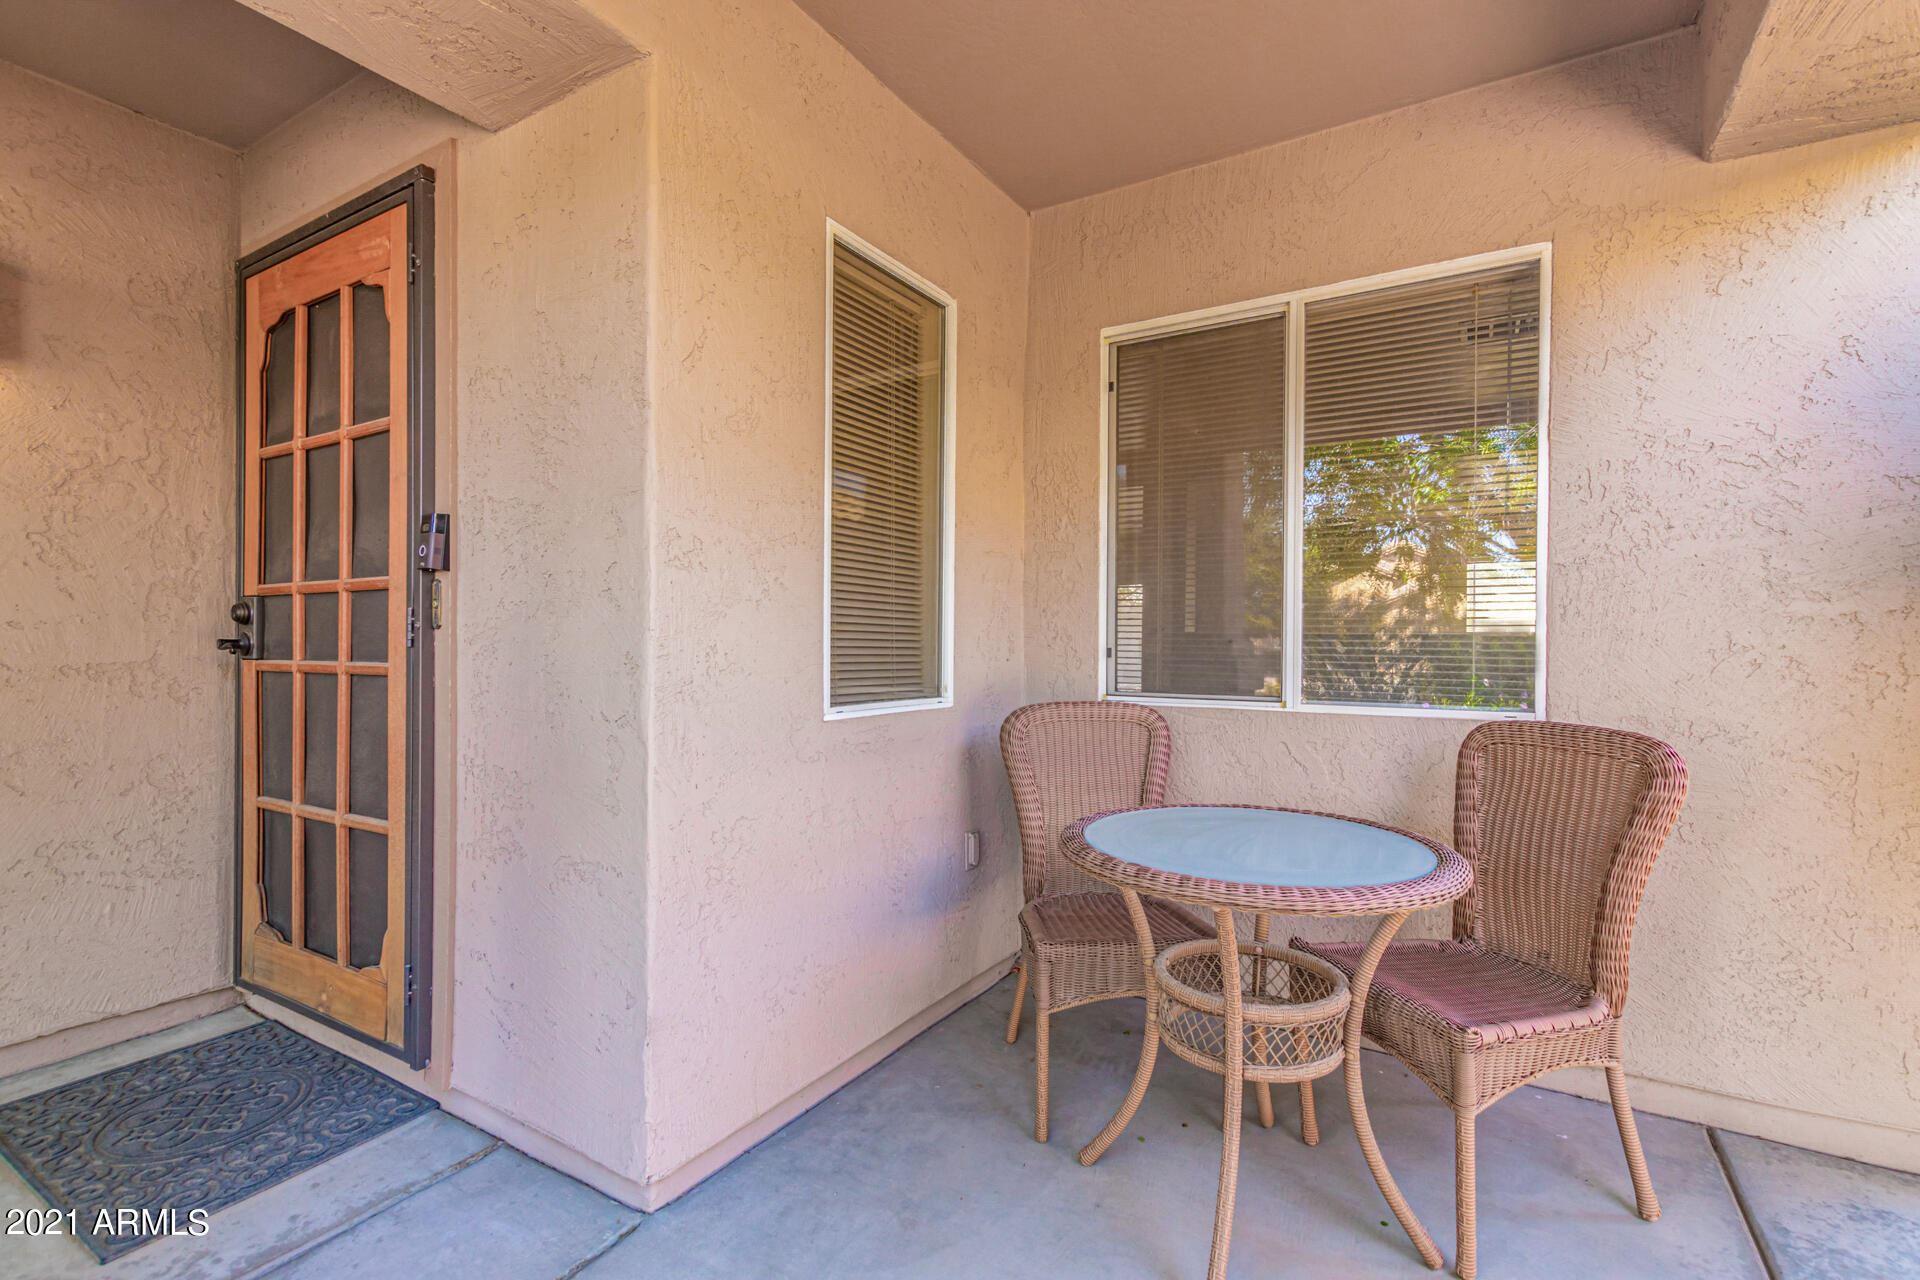 Photo of 11625 W CAROL Avenue, Youngtown, AZ 85363 (MLS # 6297118)